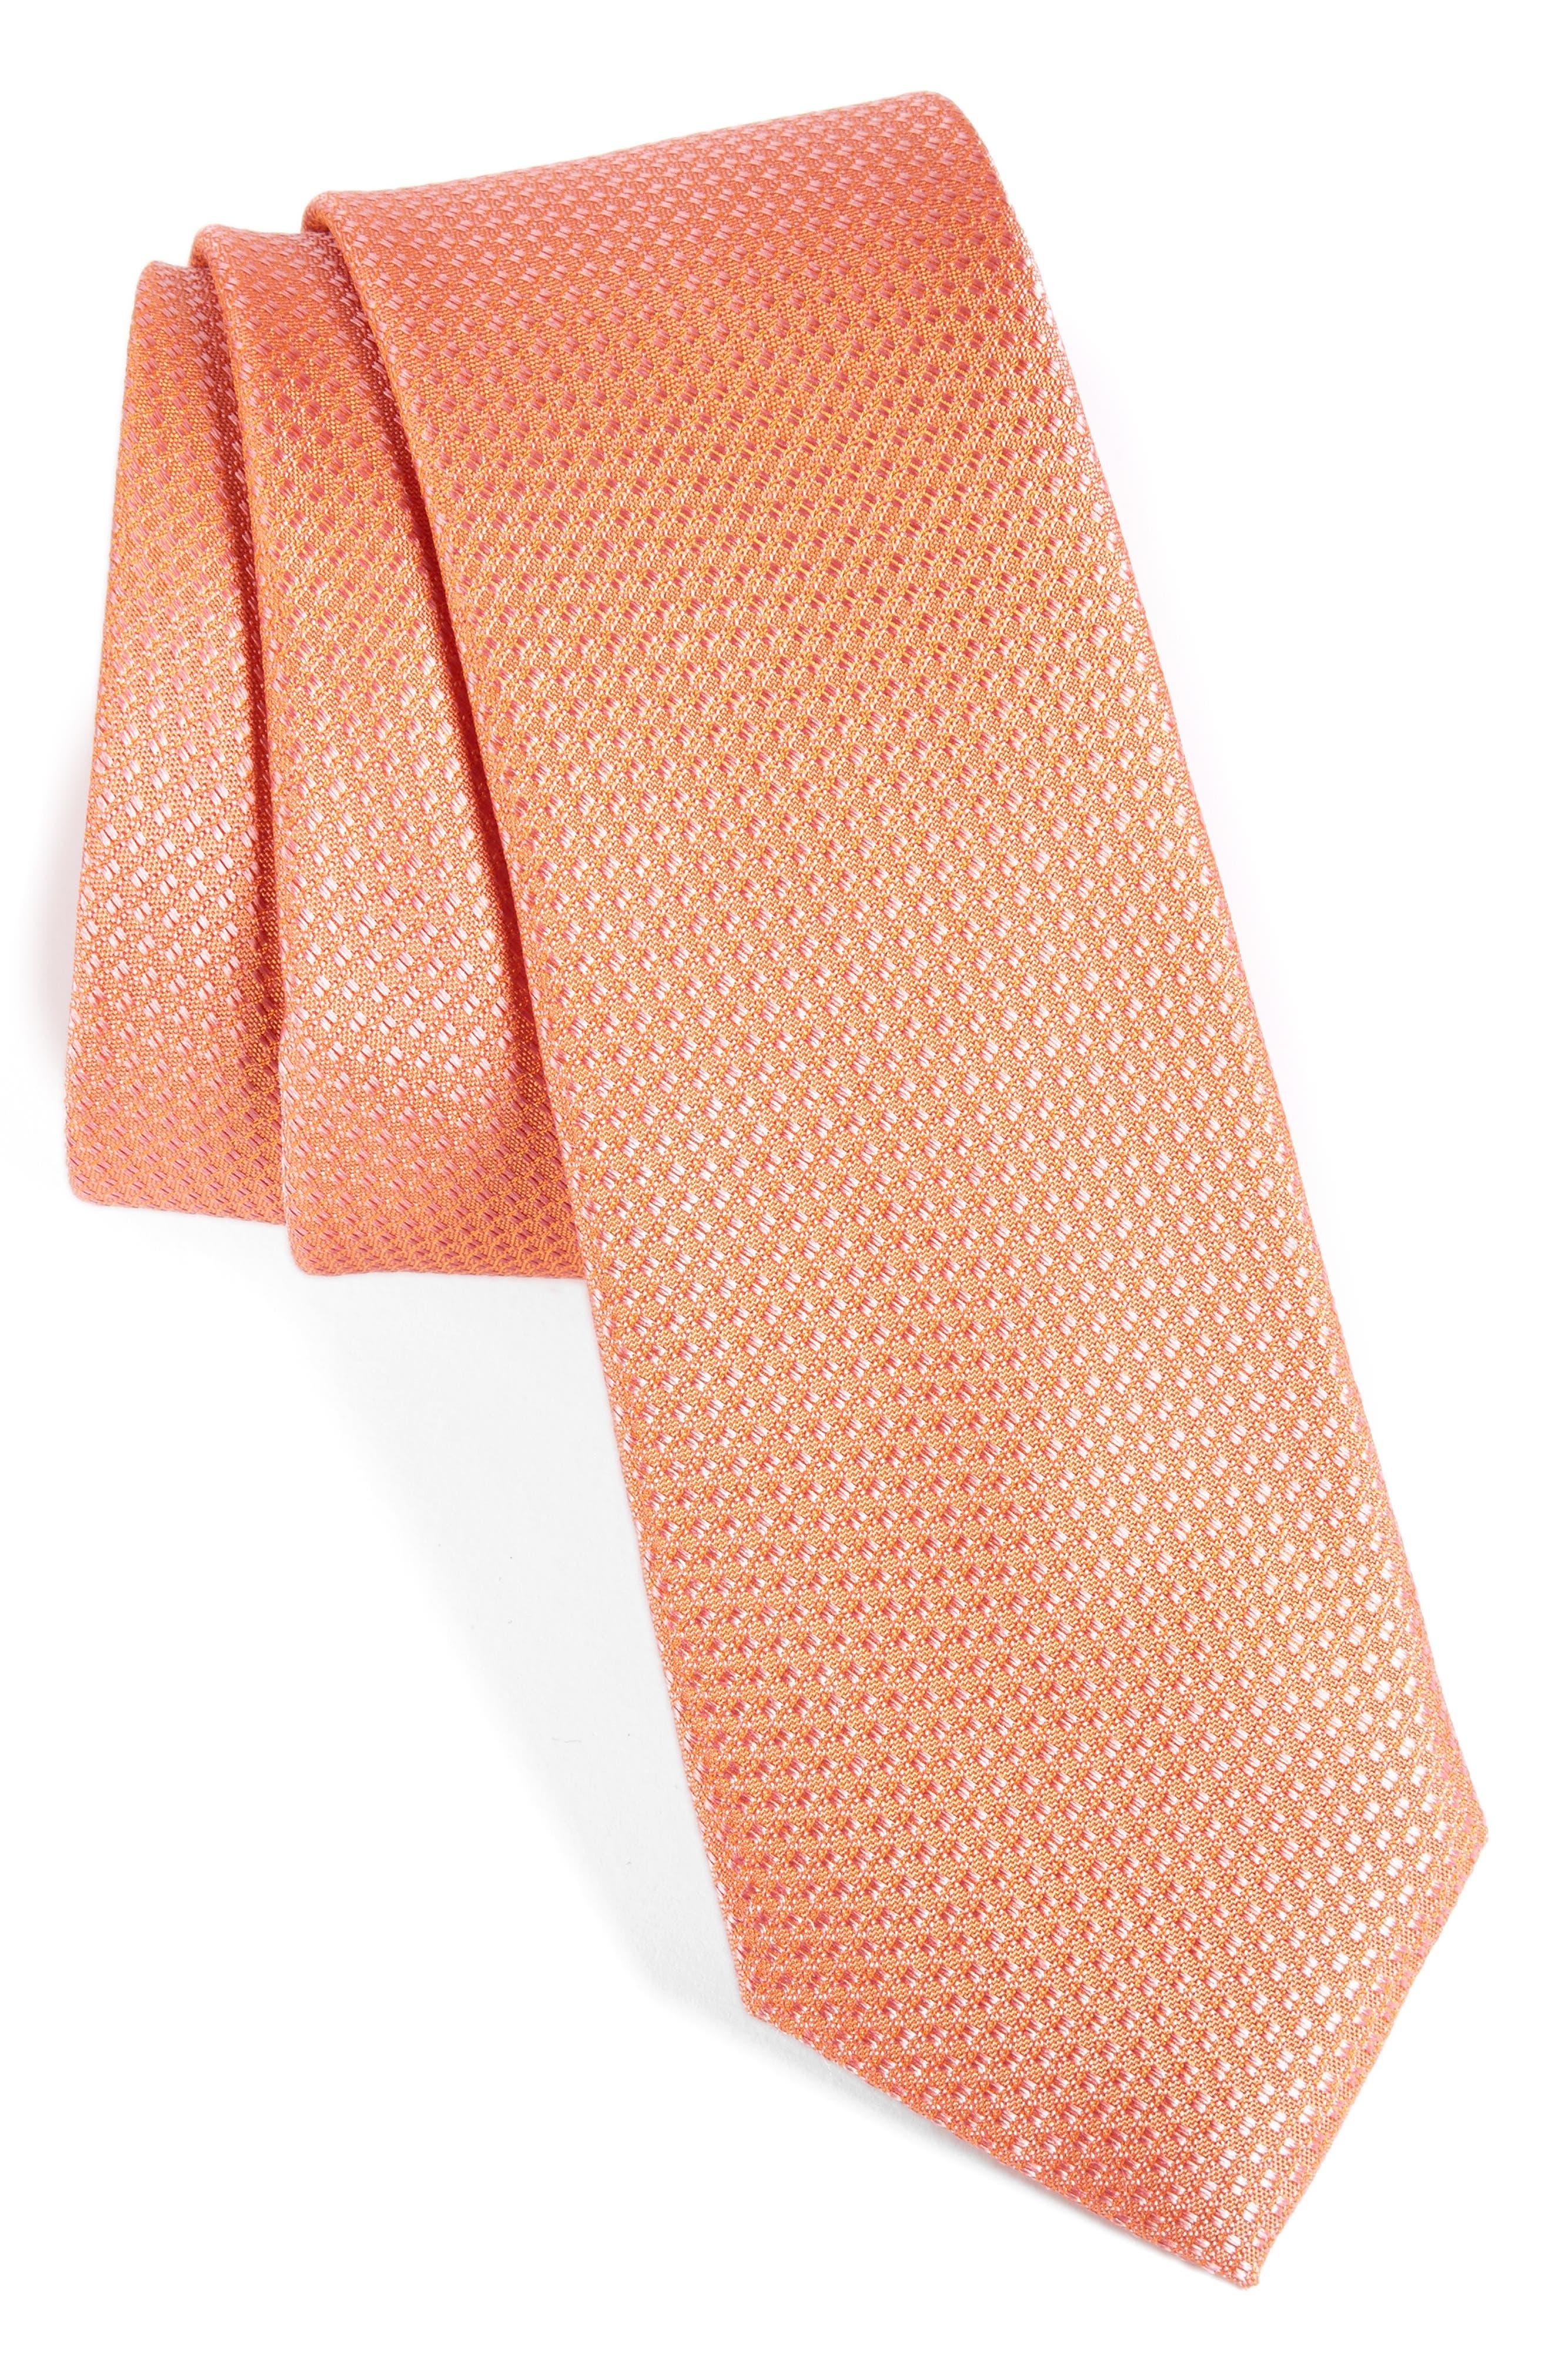 Seattle Textured Silk Tie,                             Main thumbnail 33, color,